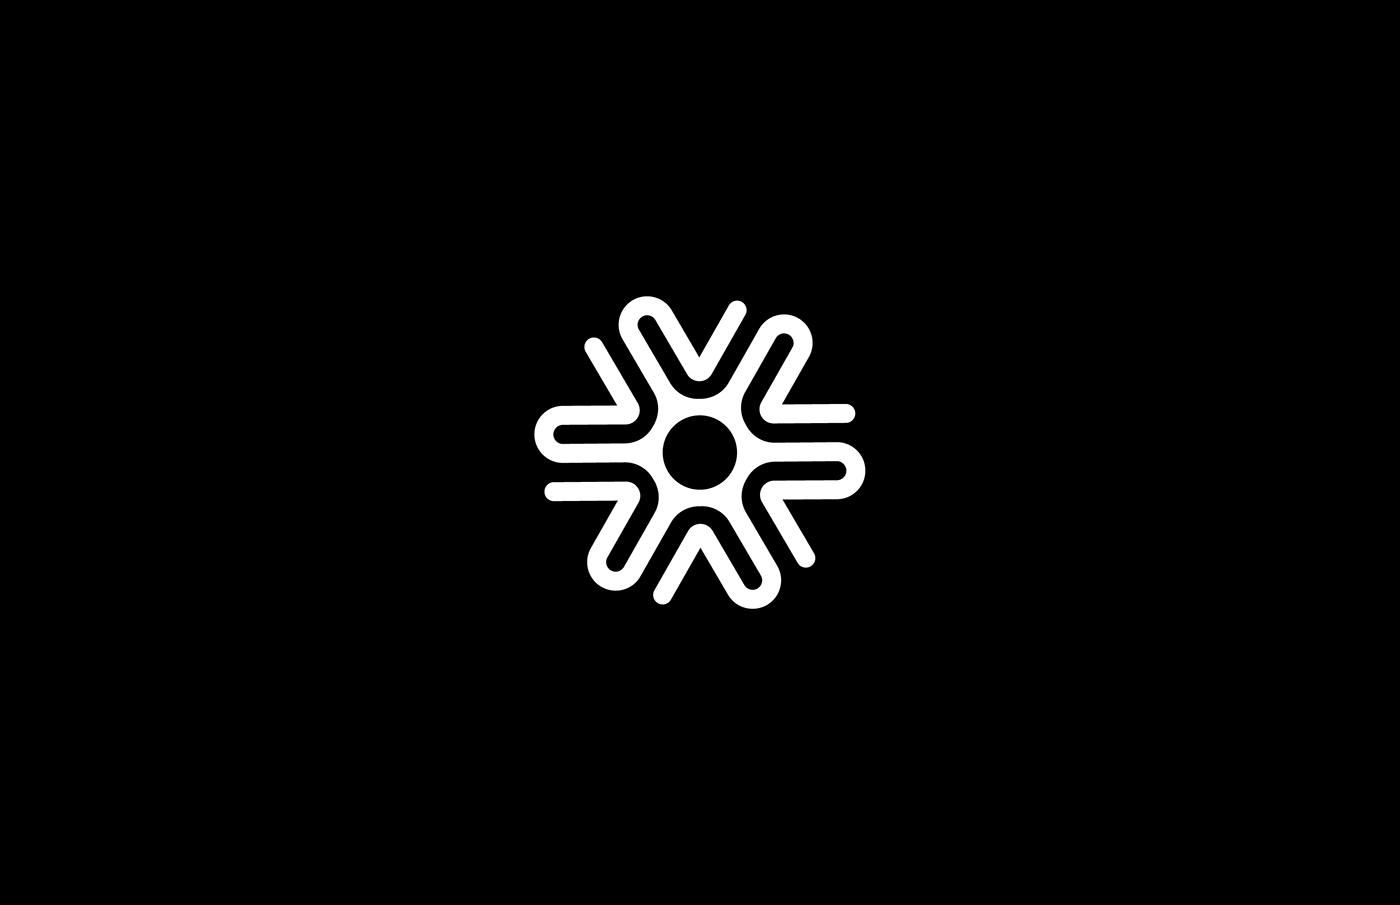 abstract black white monochrome design Icon logo Logotype mark shape symbol brand identity